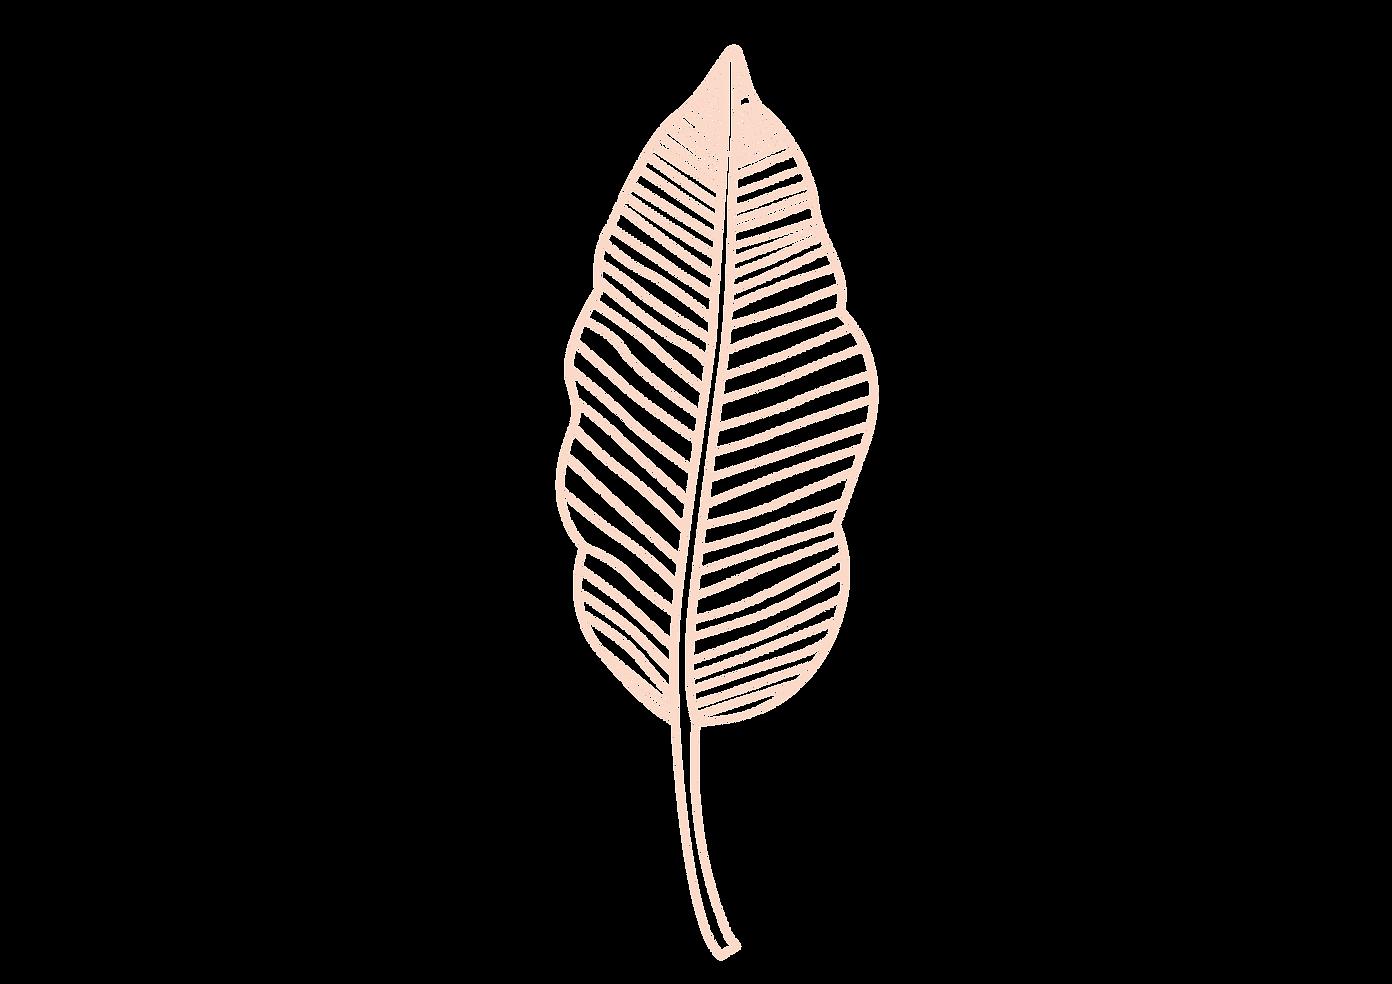 Gloavo_Logo Deck.004.png